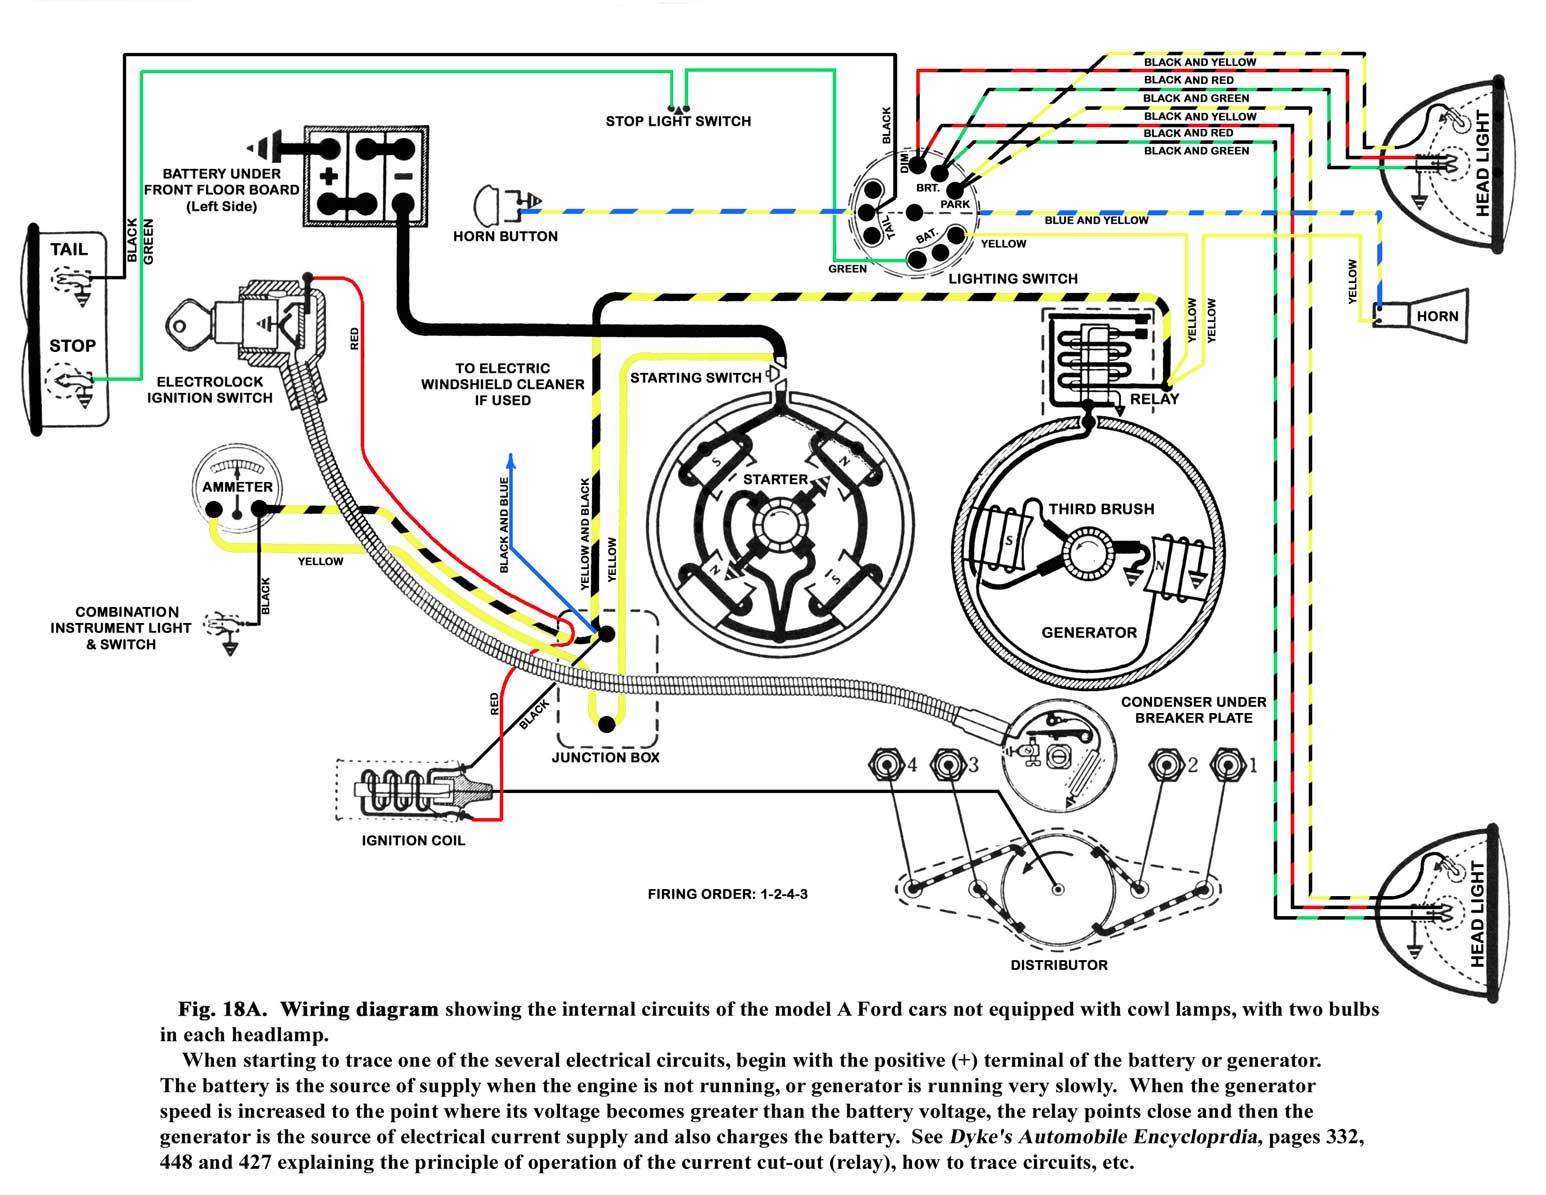 hight resolution of 12 volt generator wiring diagram wwwallischalmerscom forum ford tractor ignition switch wiring http wwwpic2flycom ford